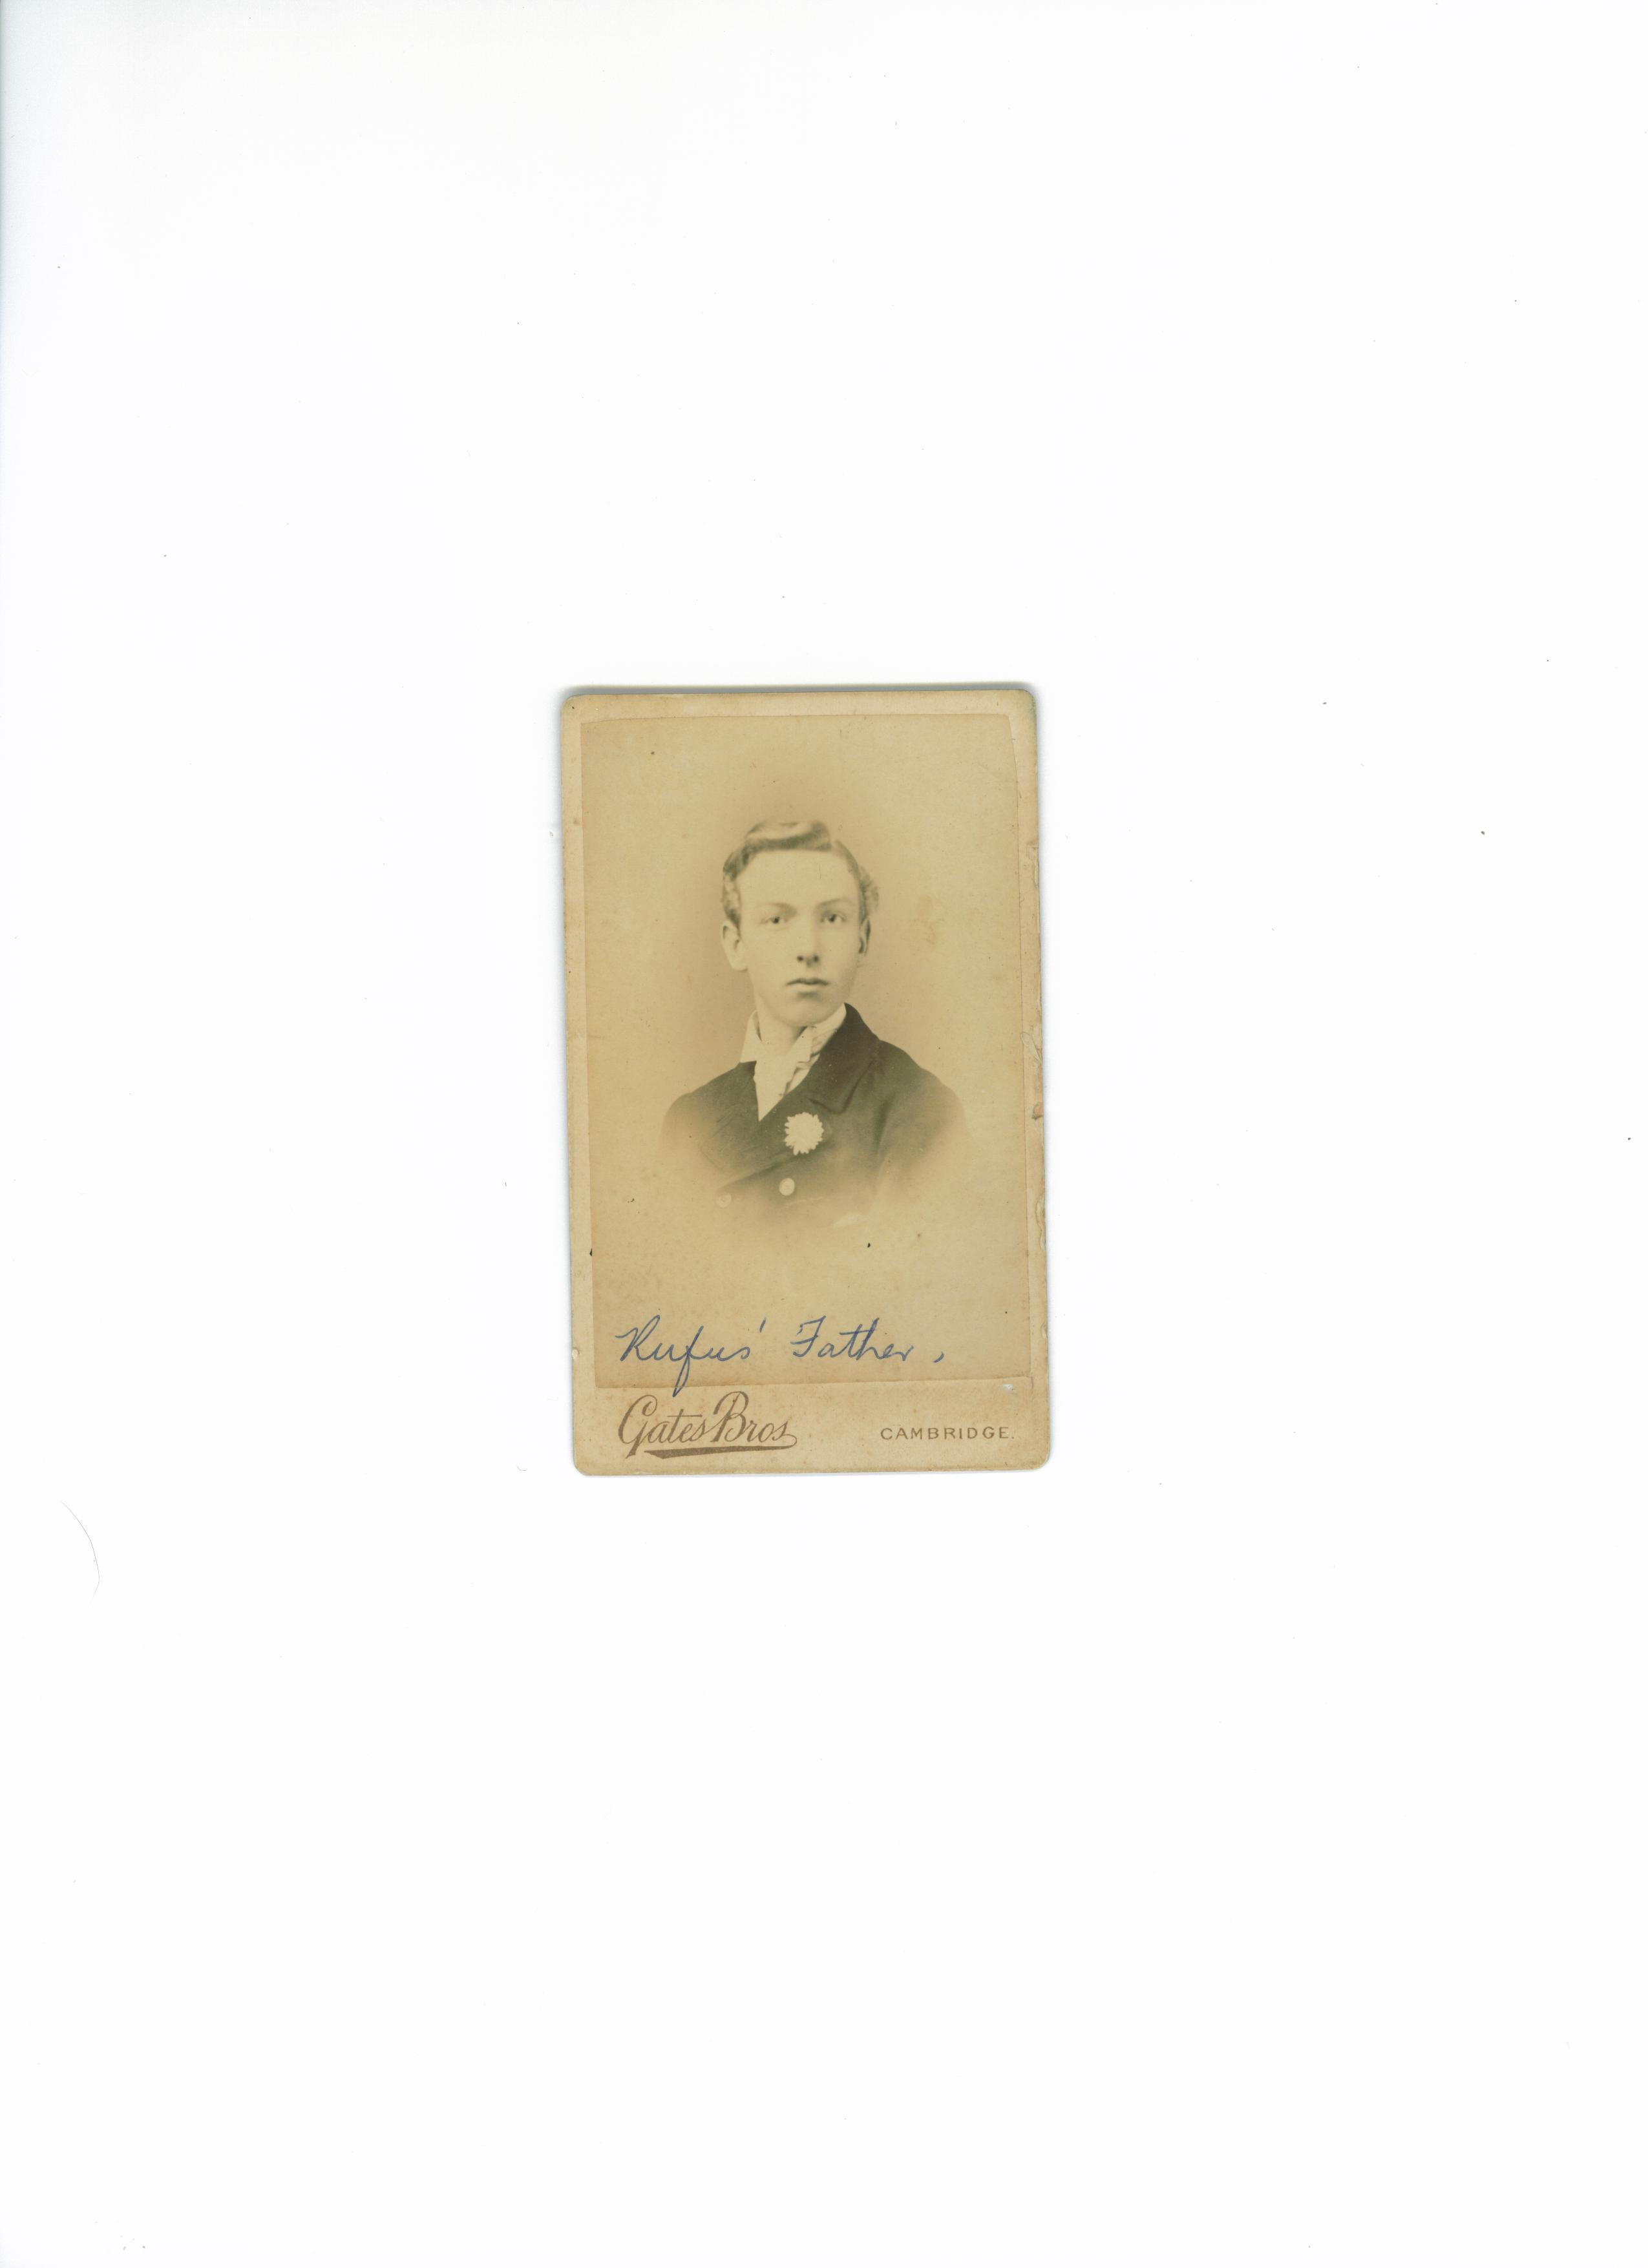 Arthur Reynolds